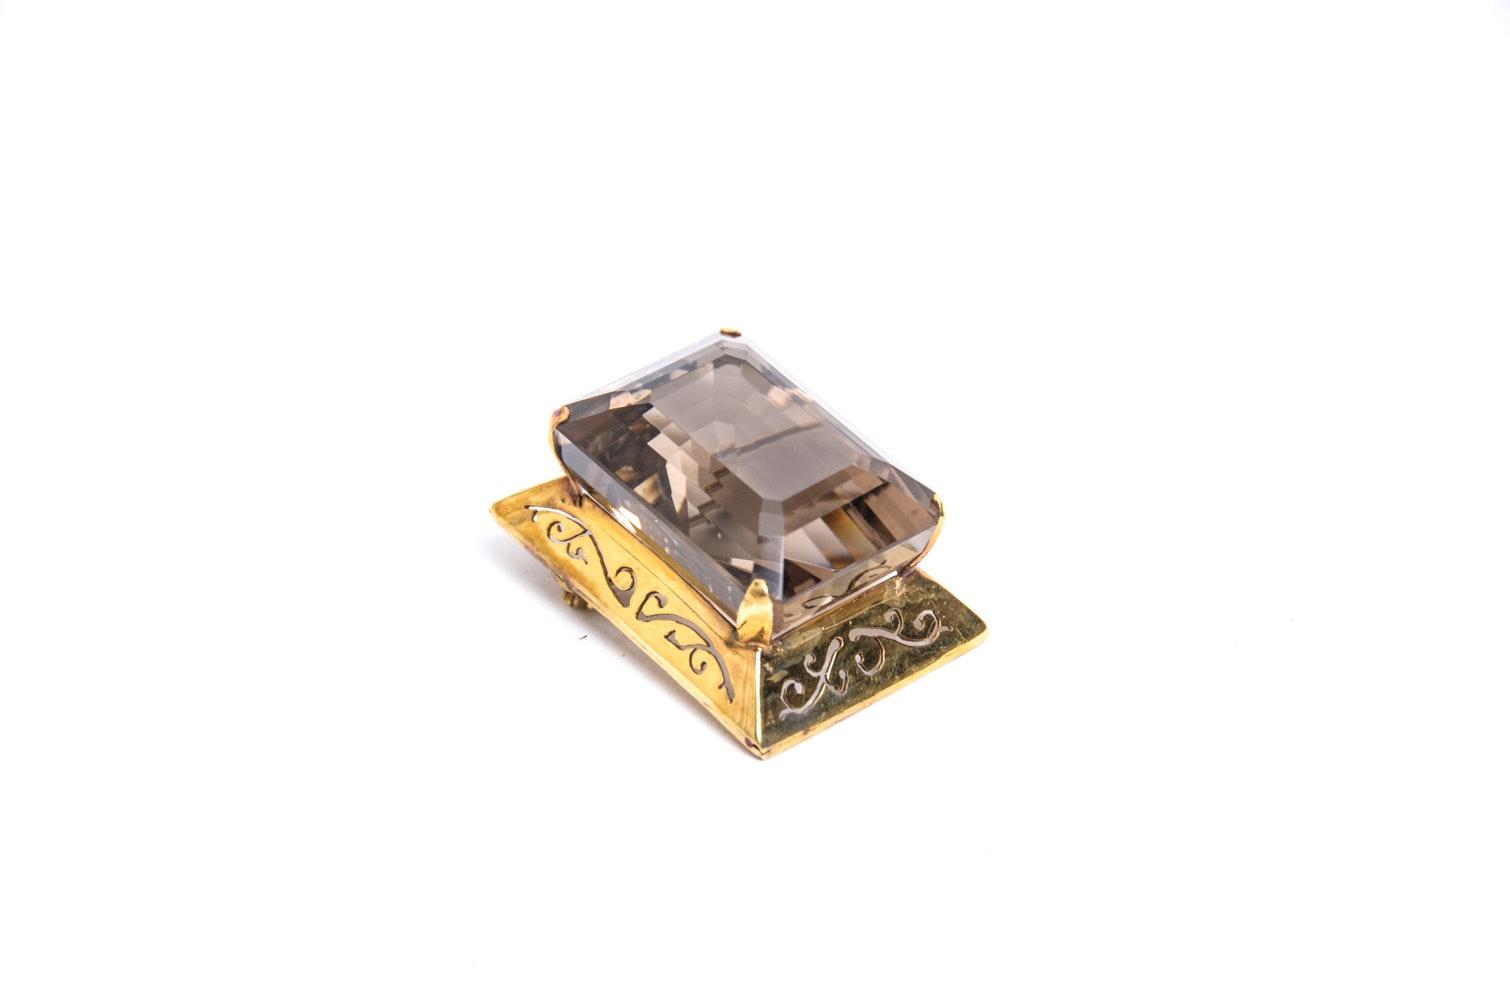 14K Gold and 95 CT Smokey Quartz Brooch Pendant